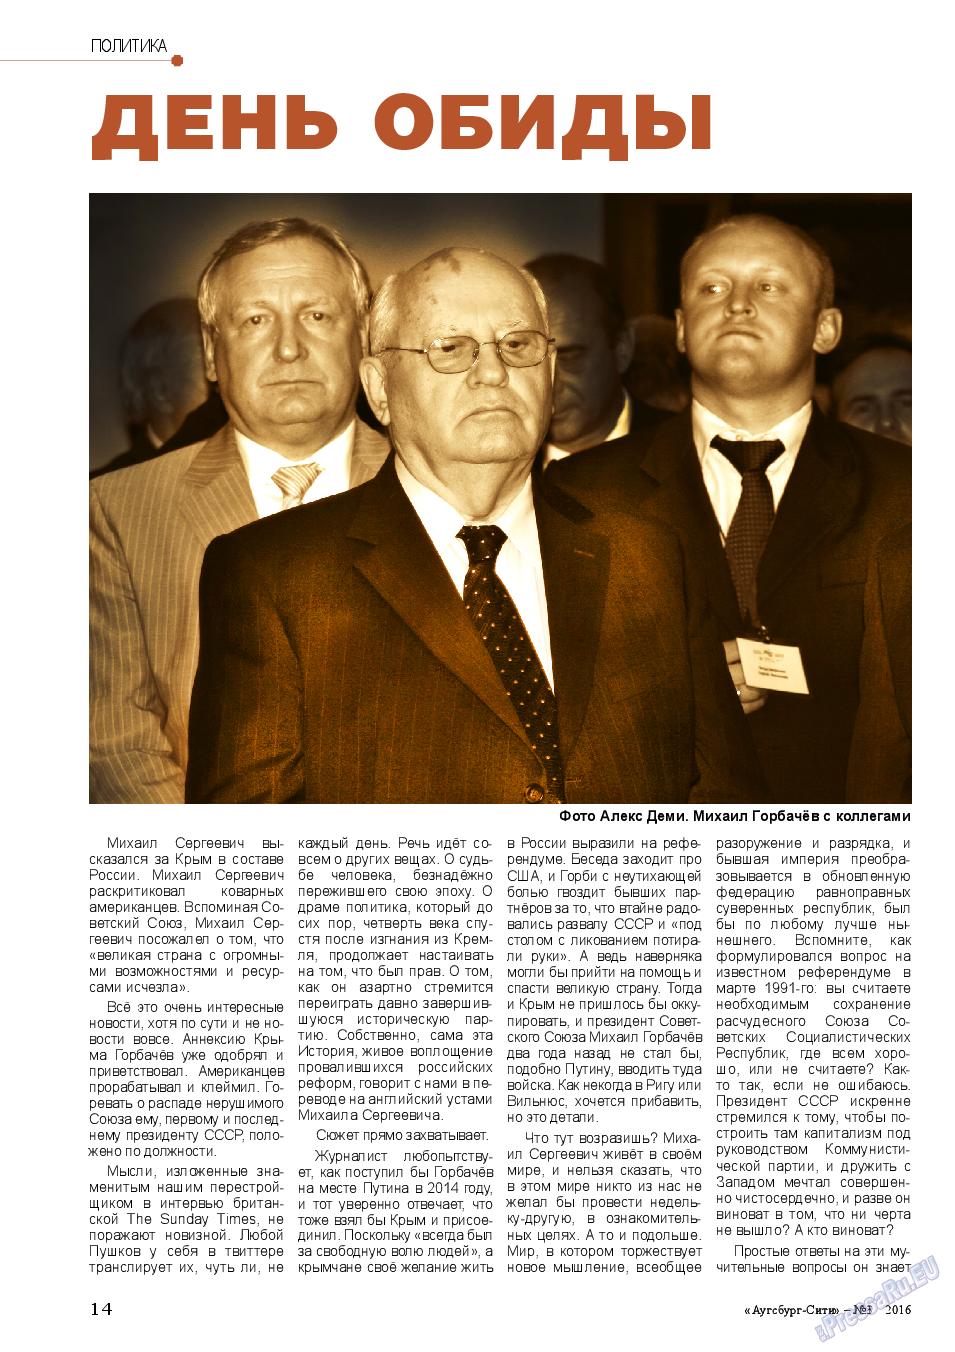 Горбачёв 21